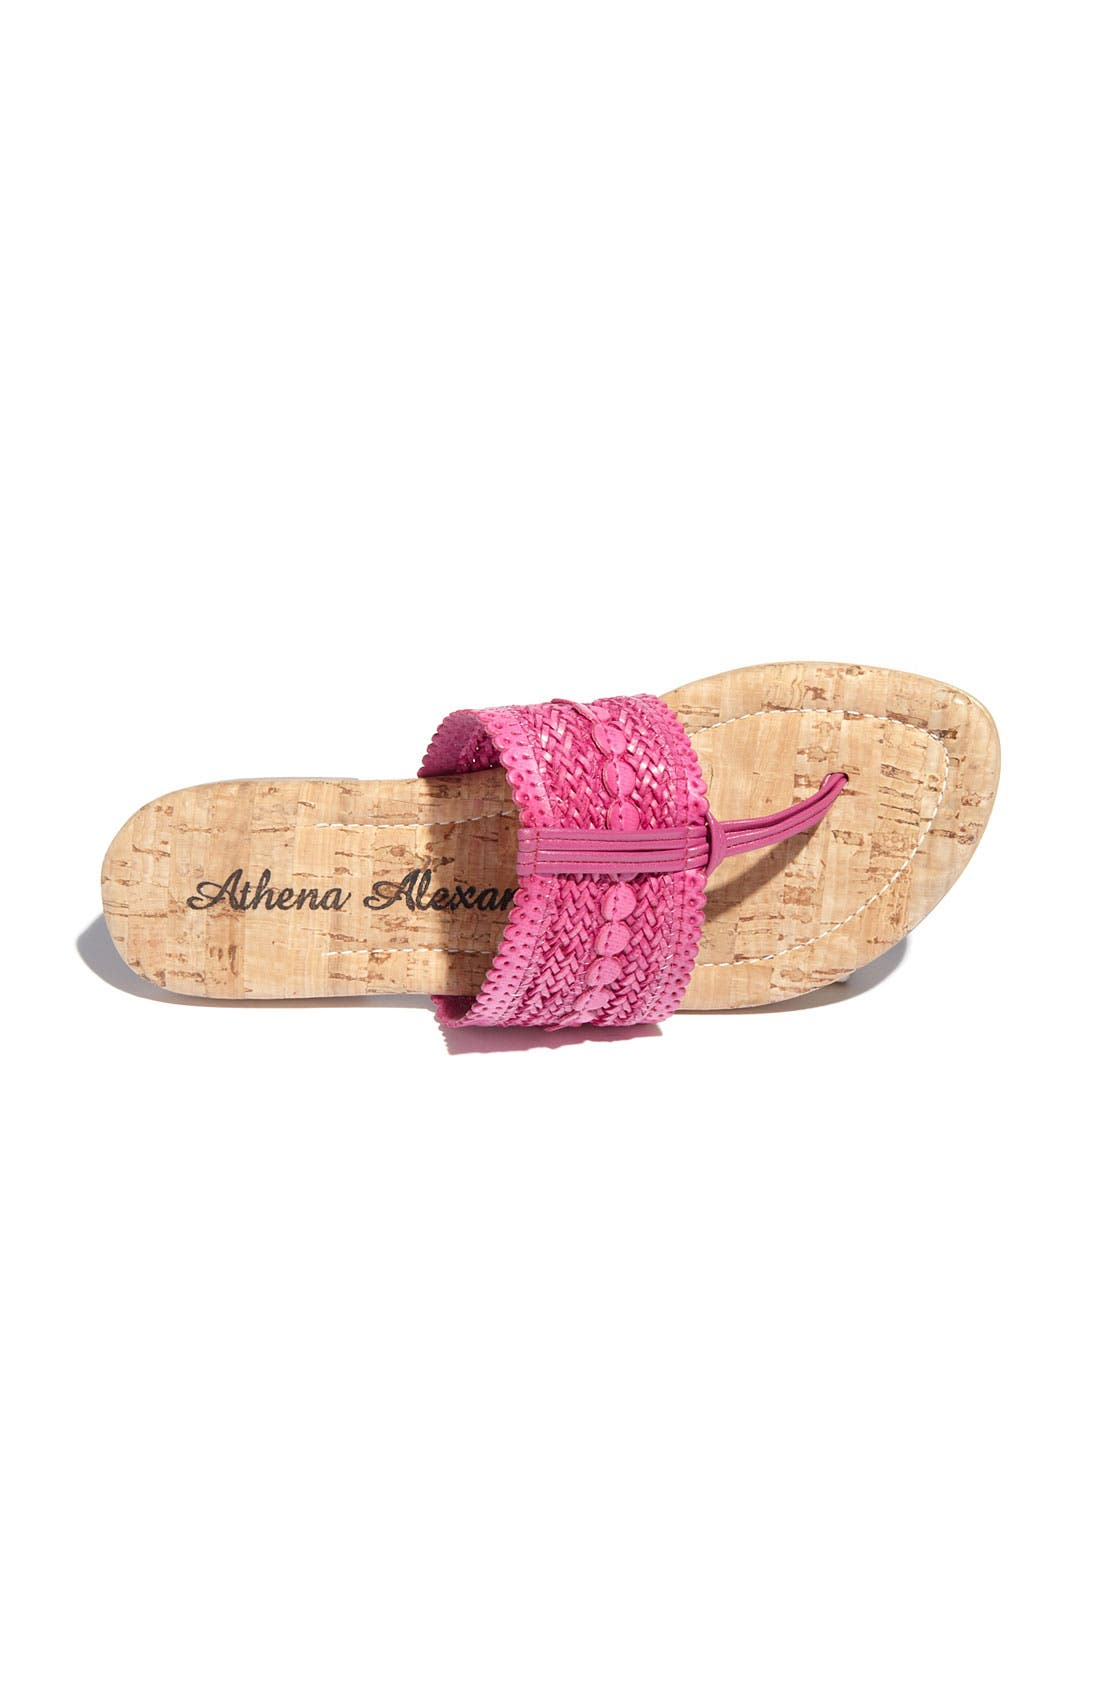 Alternate Image 3  - Athena Alexander 'Malta' Sandal